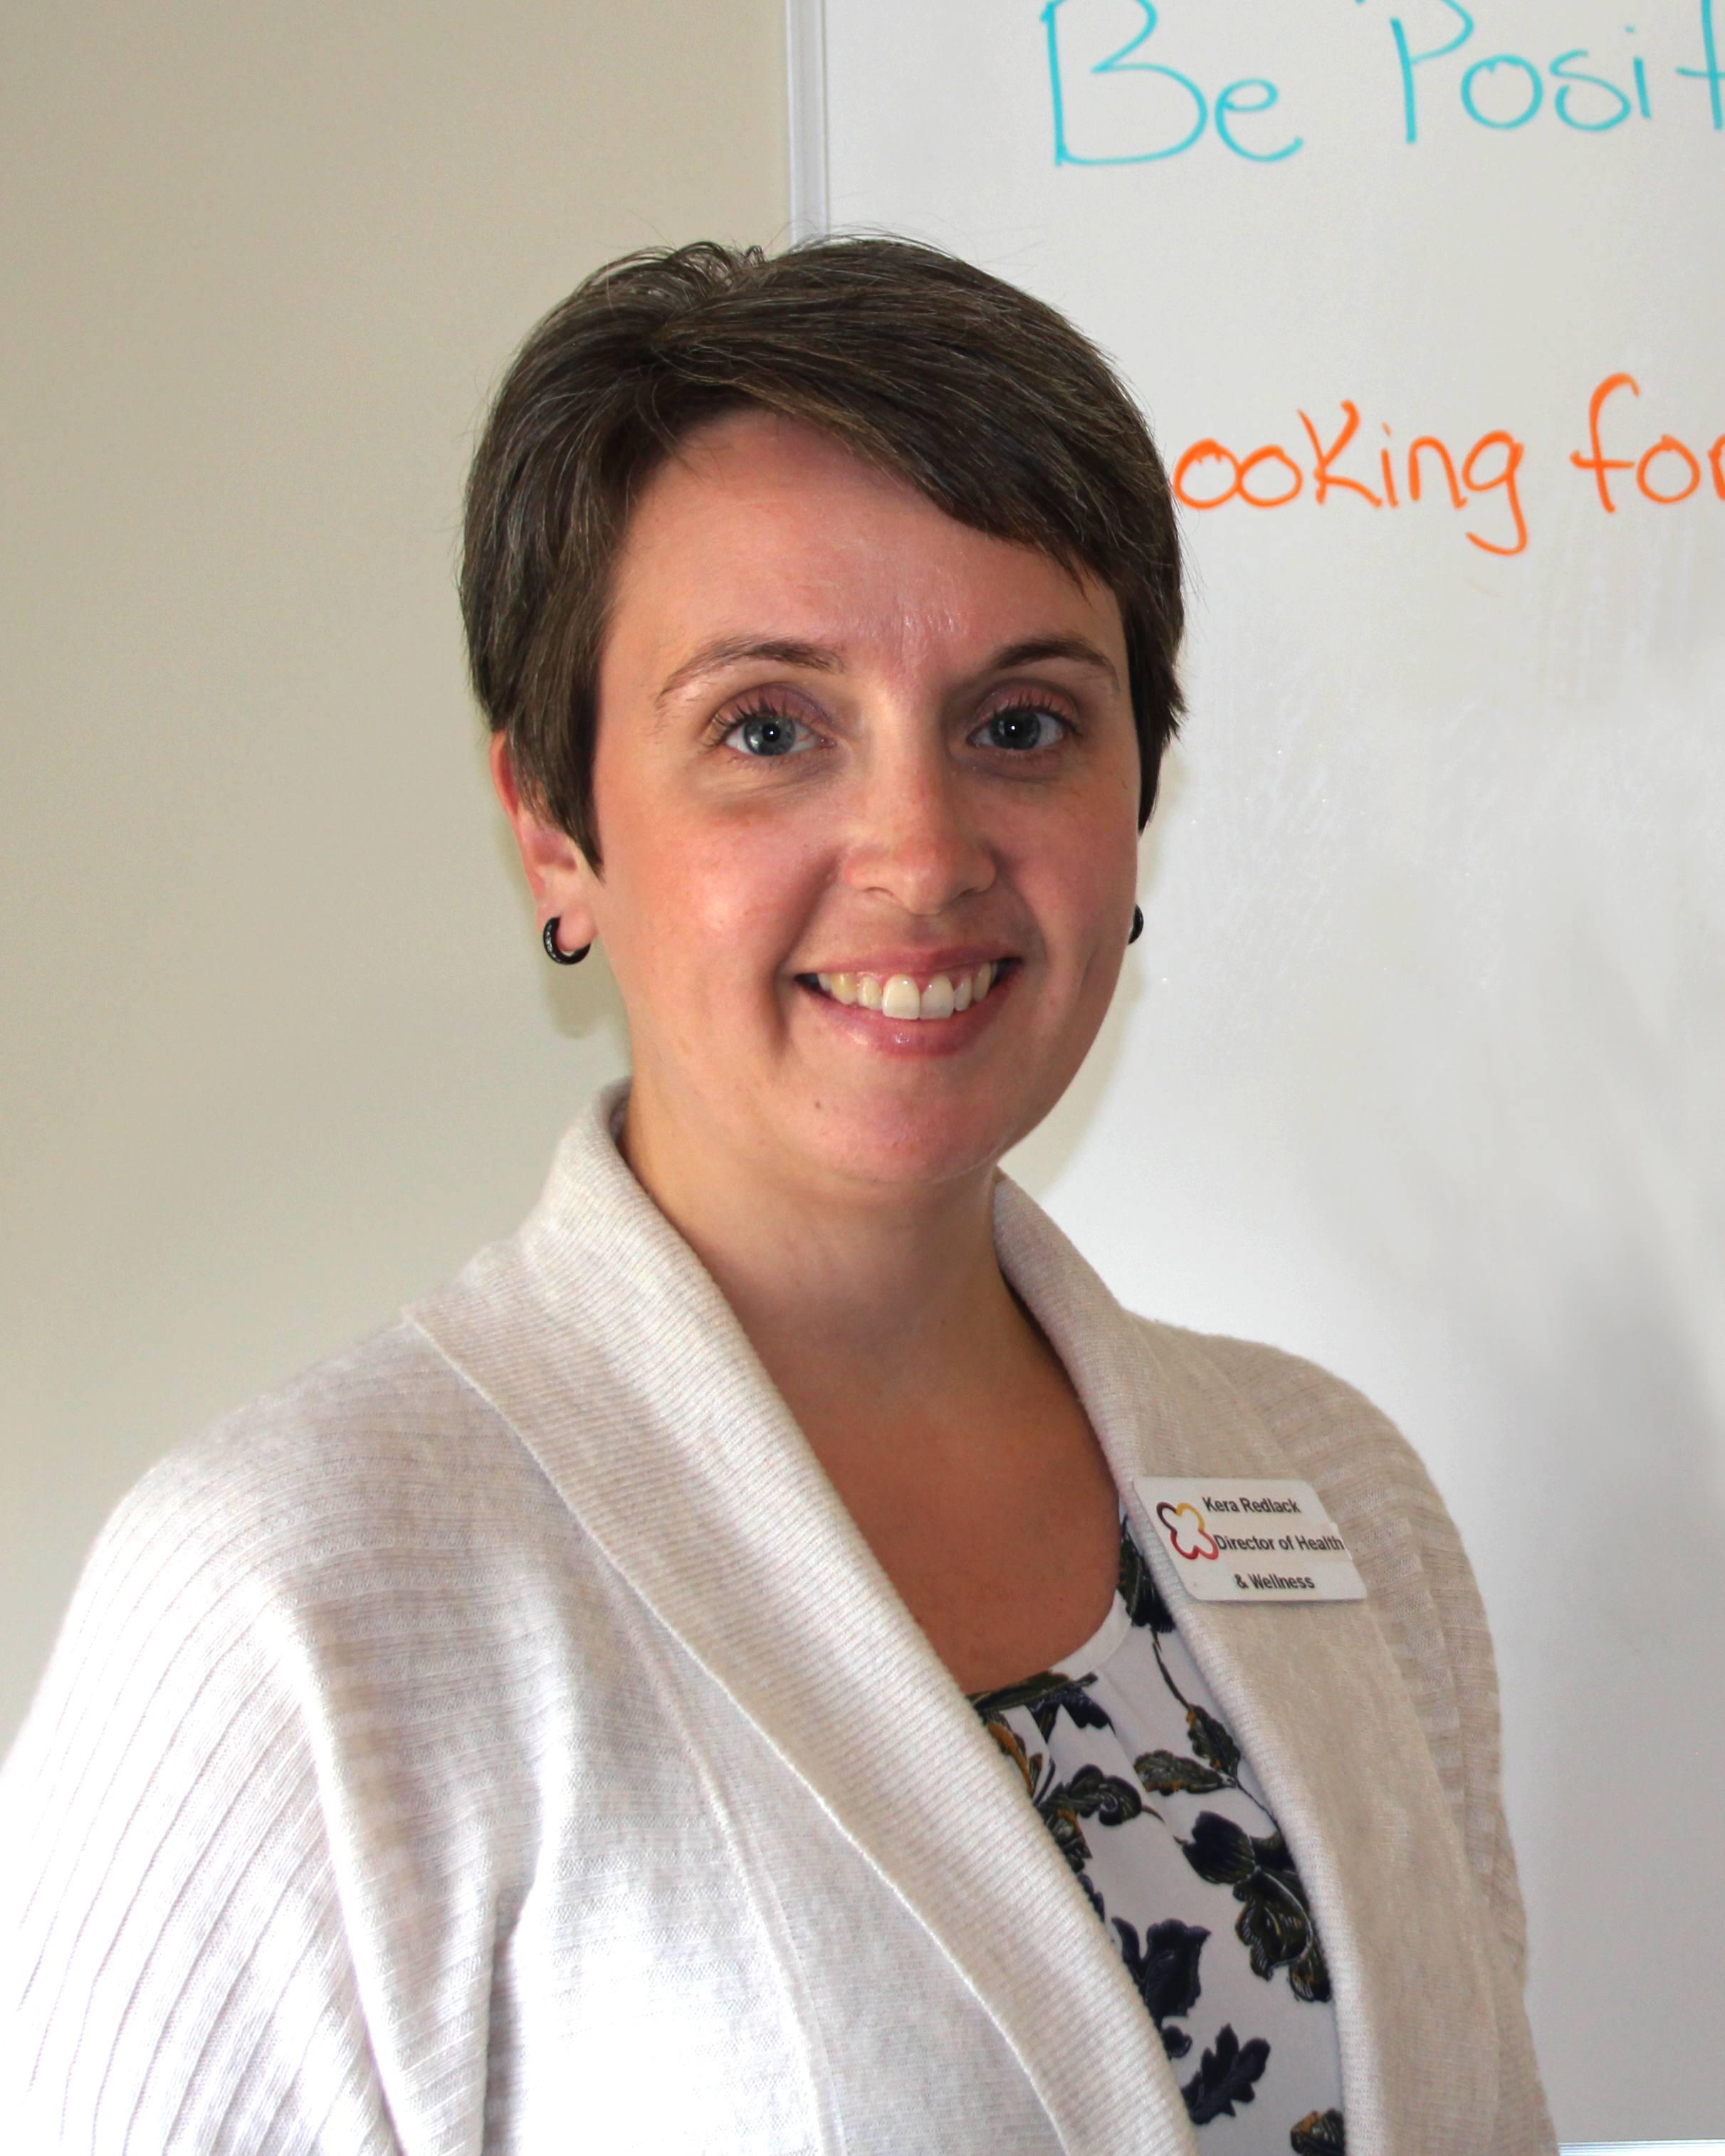 Kera Redlack, United's director of health and wellness